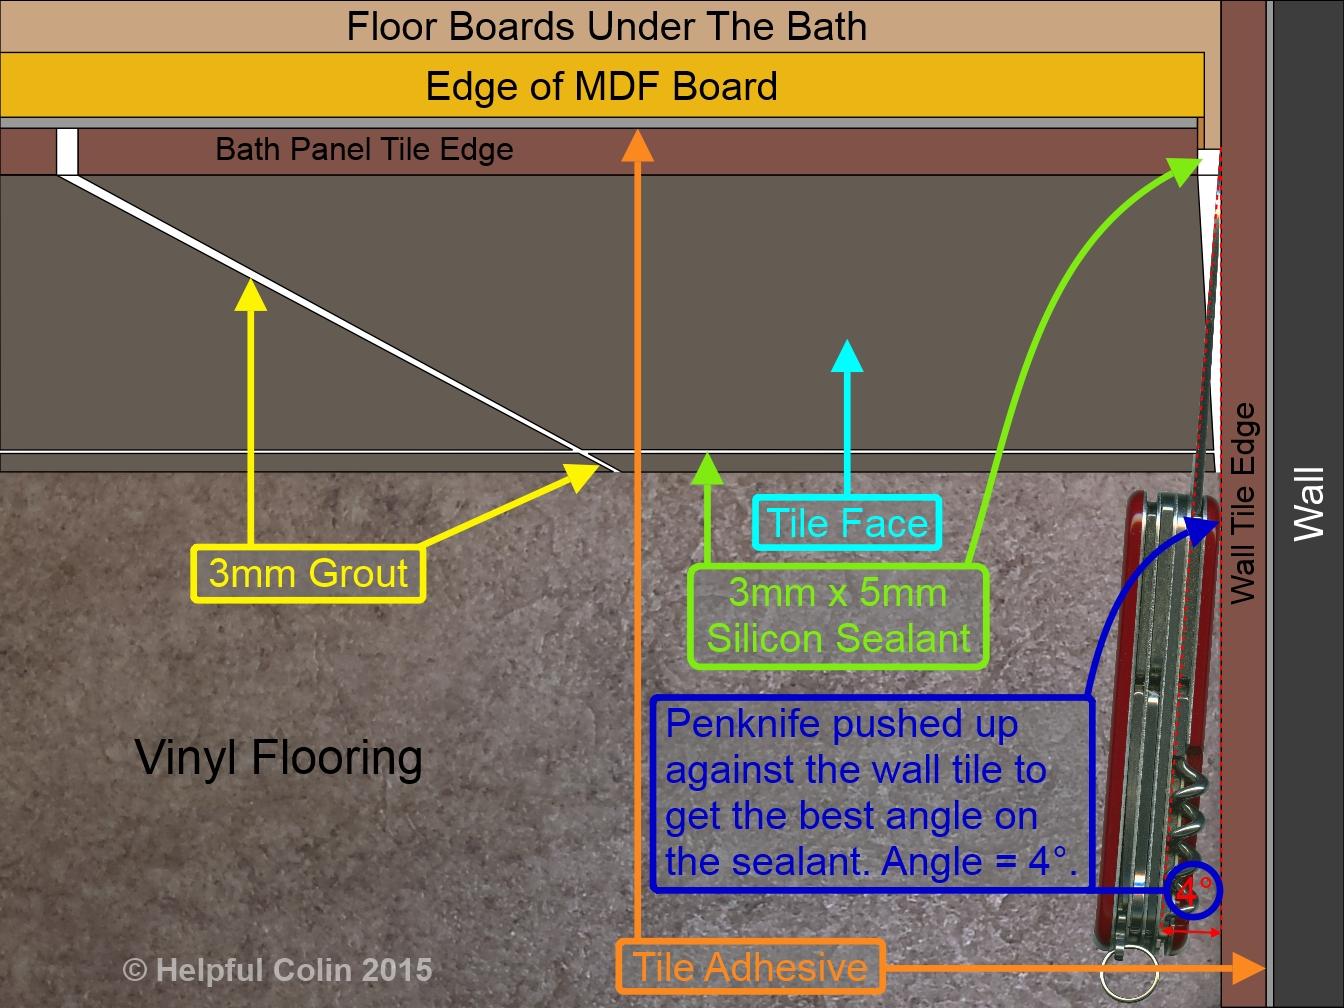 how to remove bathroom sealant tiled bath panel